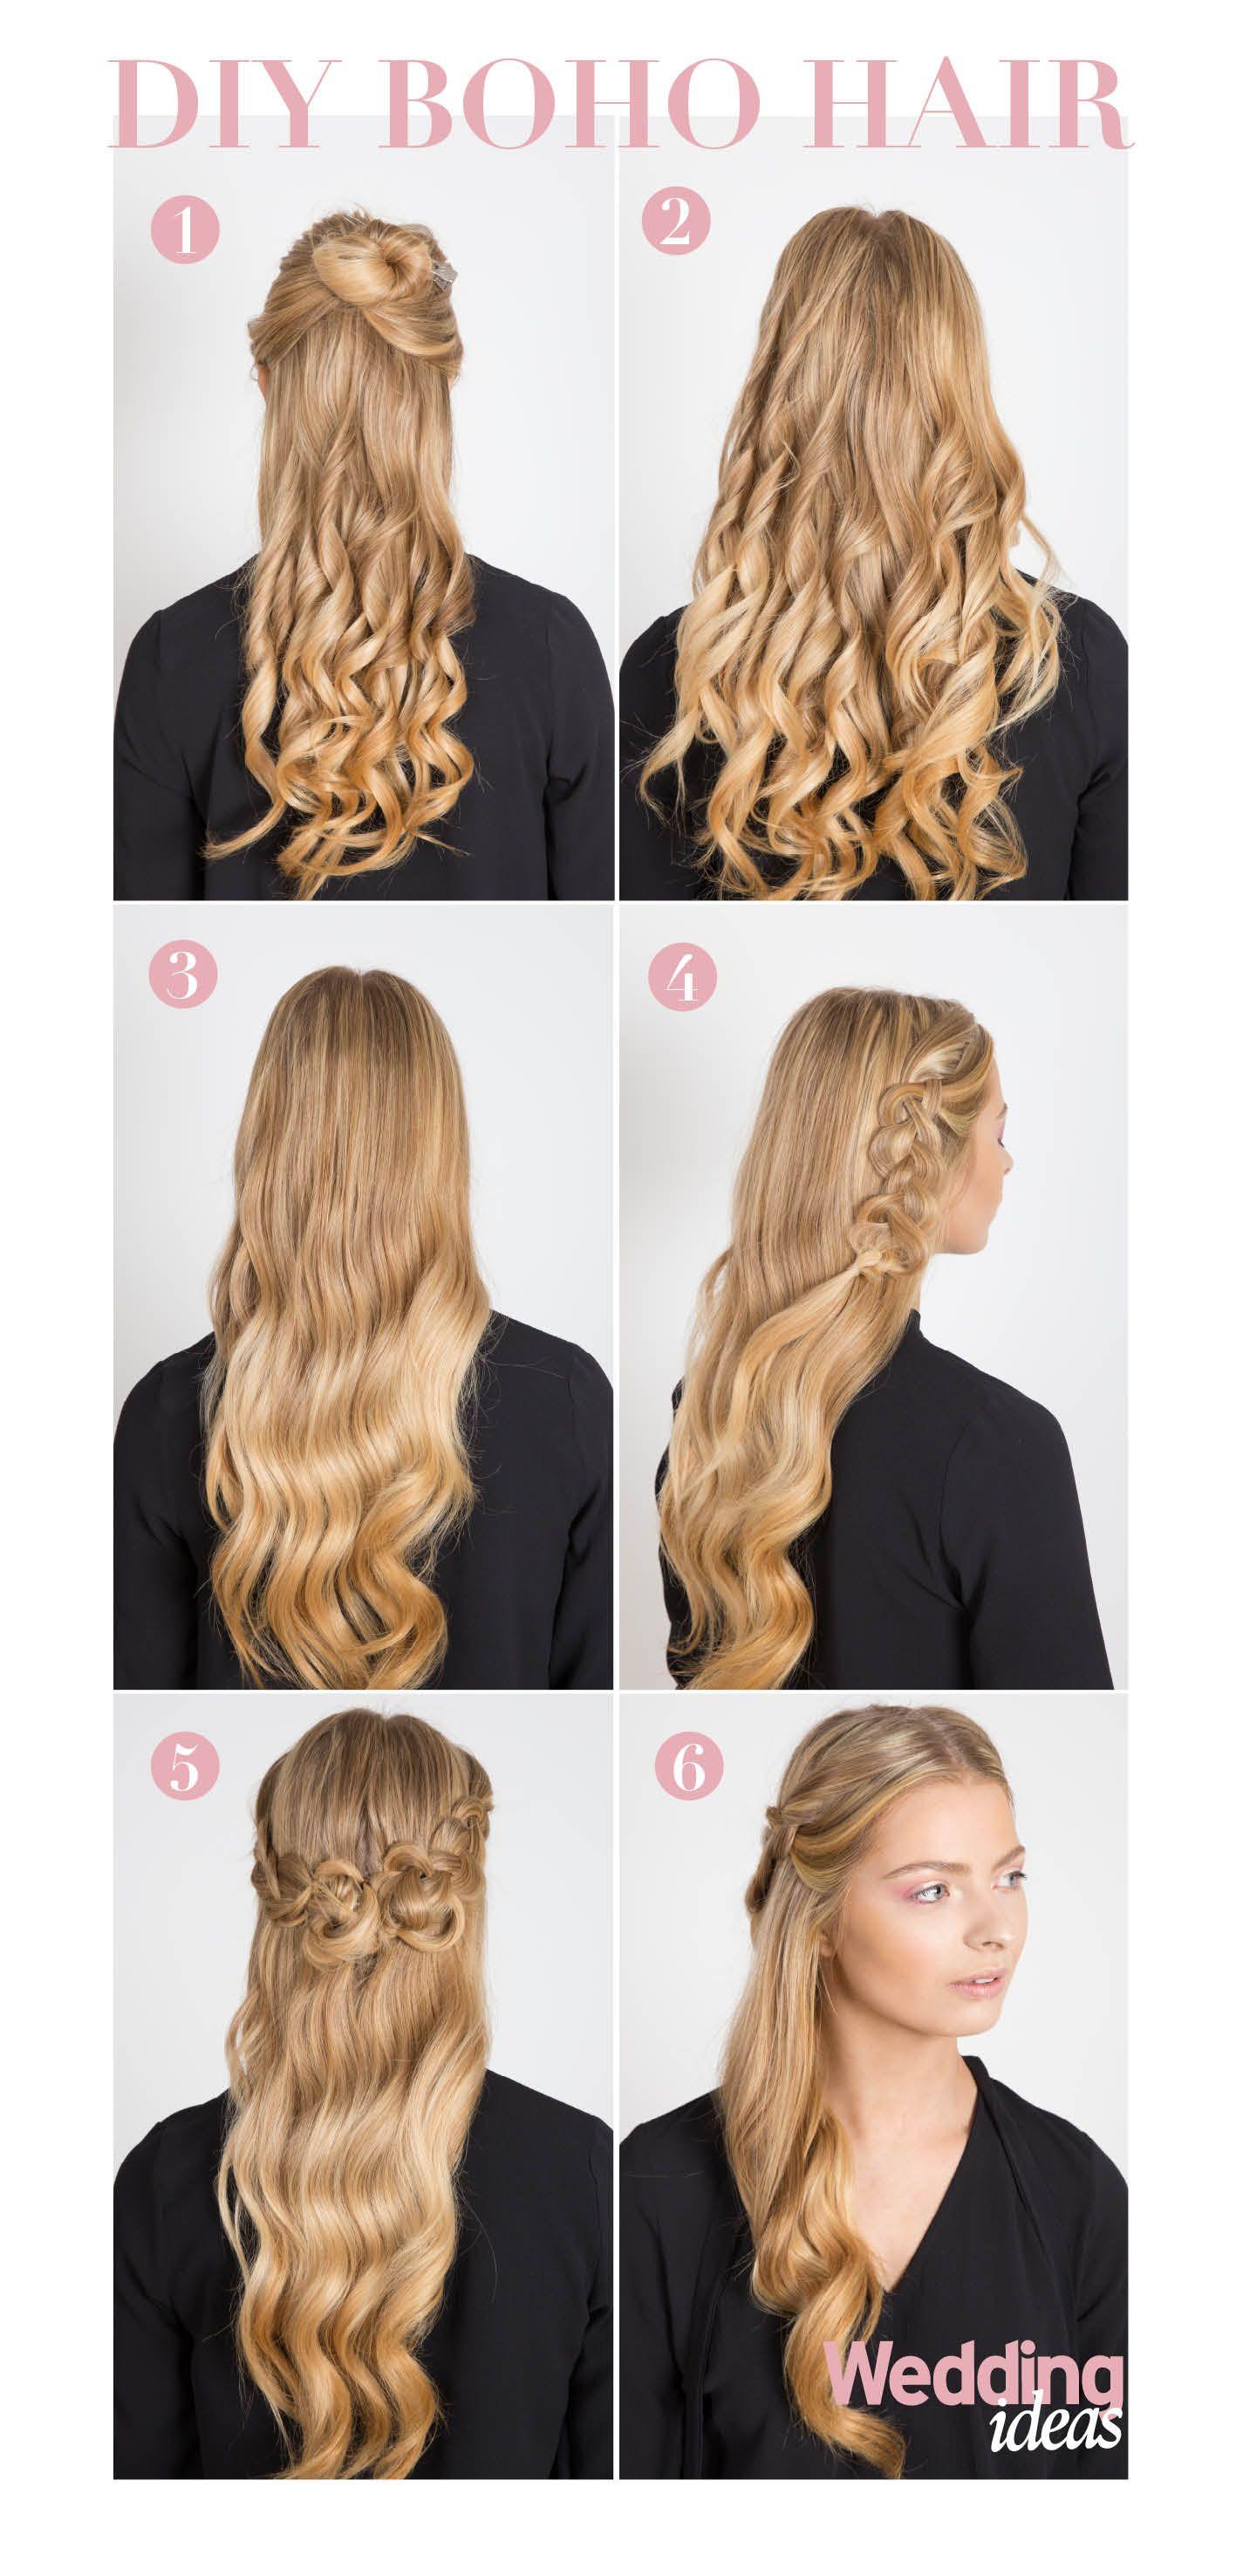 Diy Boho Hair Wedding Ideas Magazine Hair Styles Wedding Hairstyles Glamorous Wedding Hair